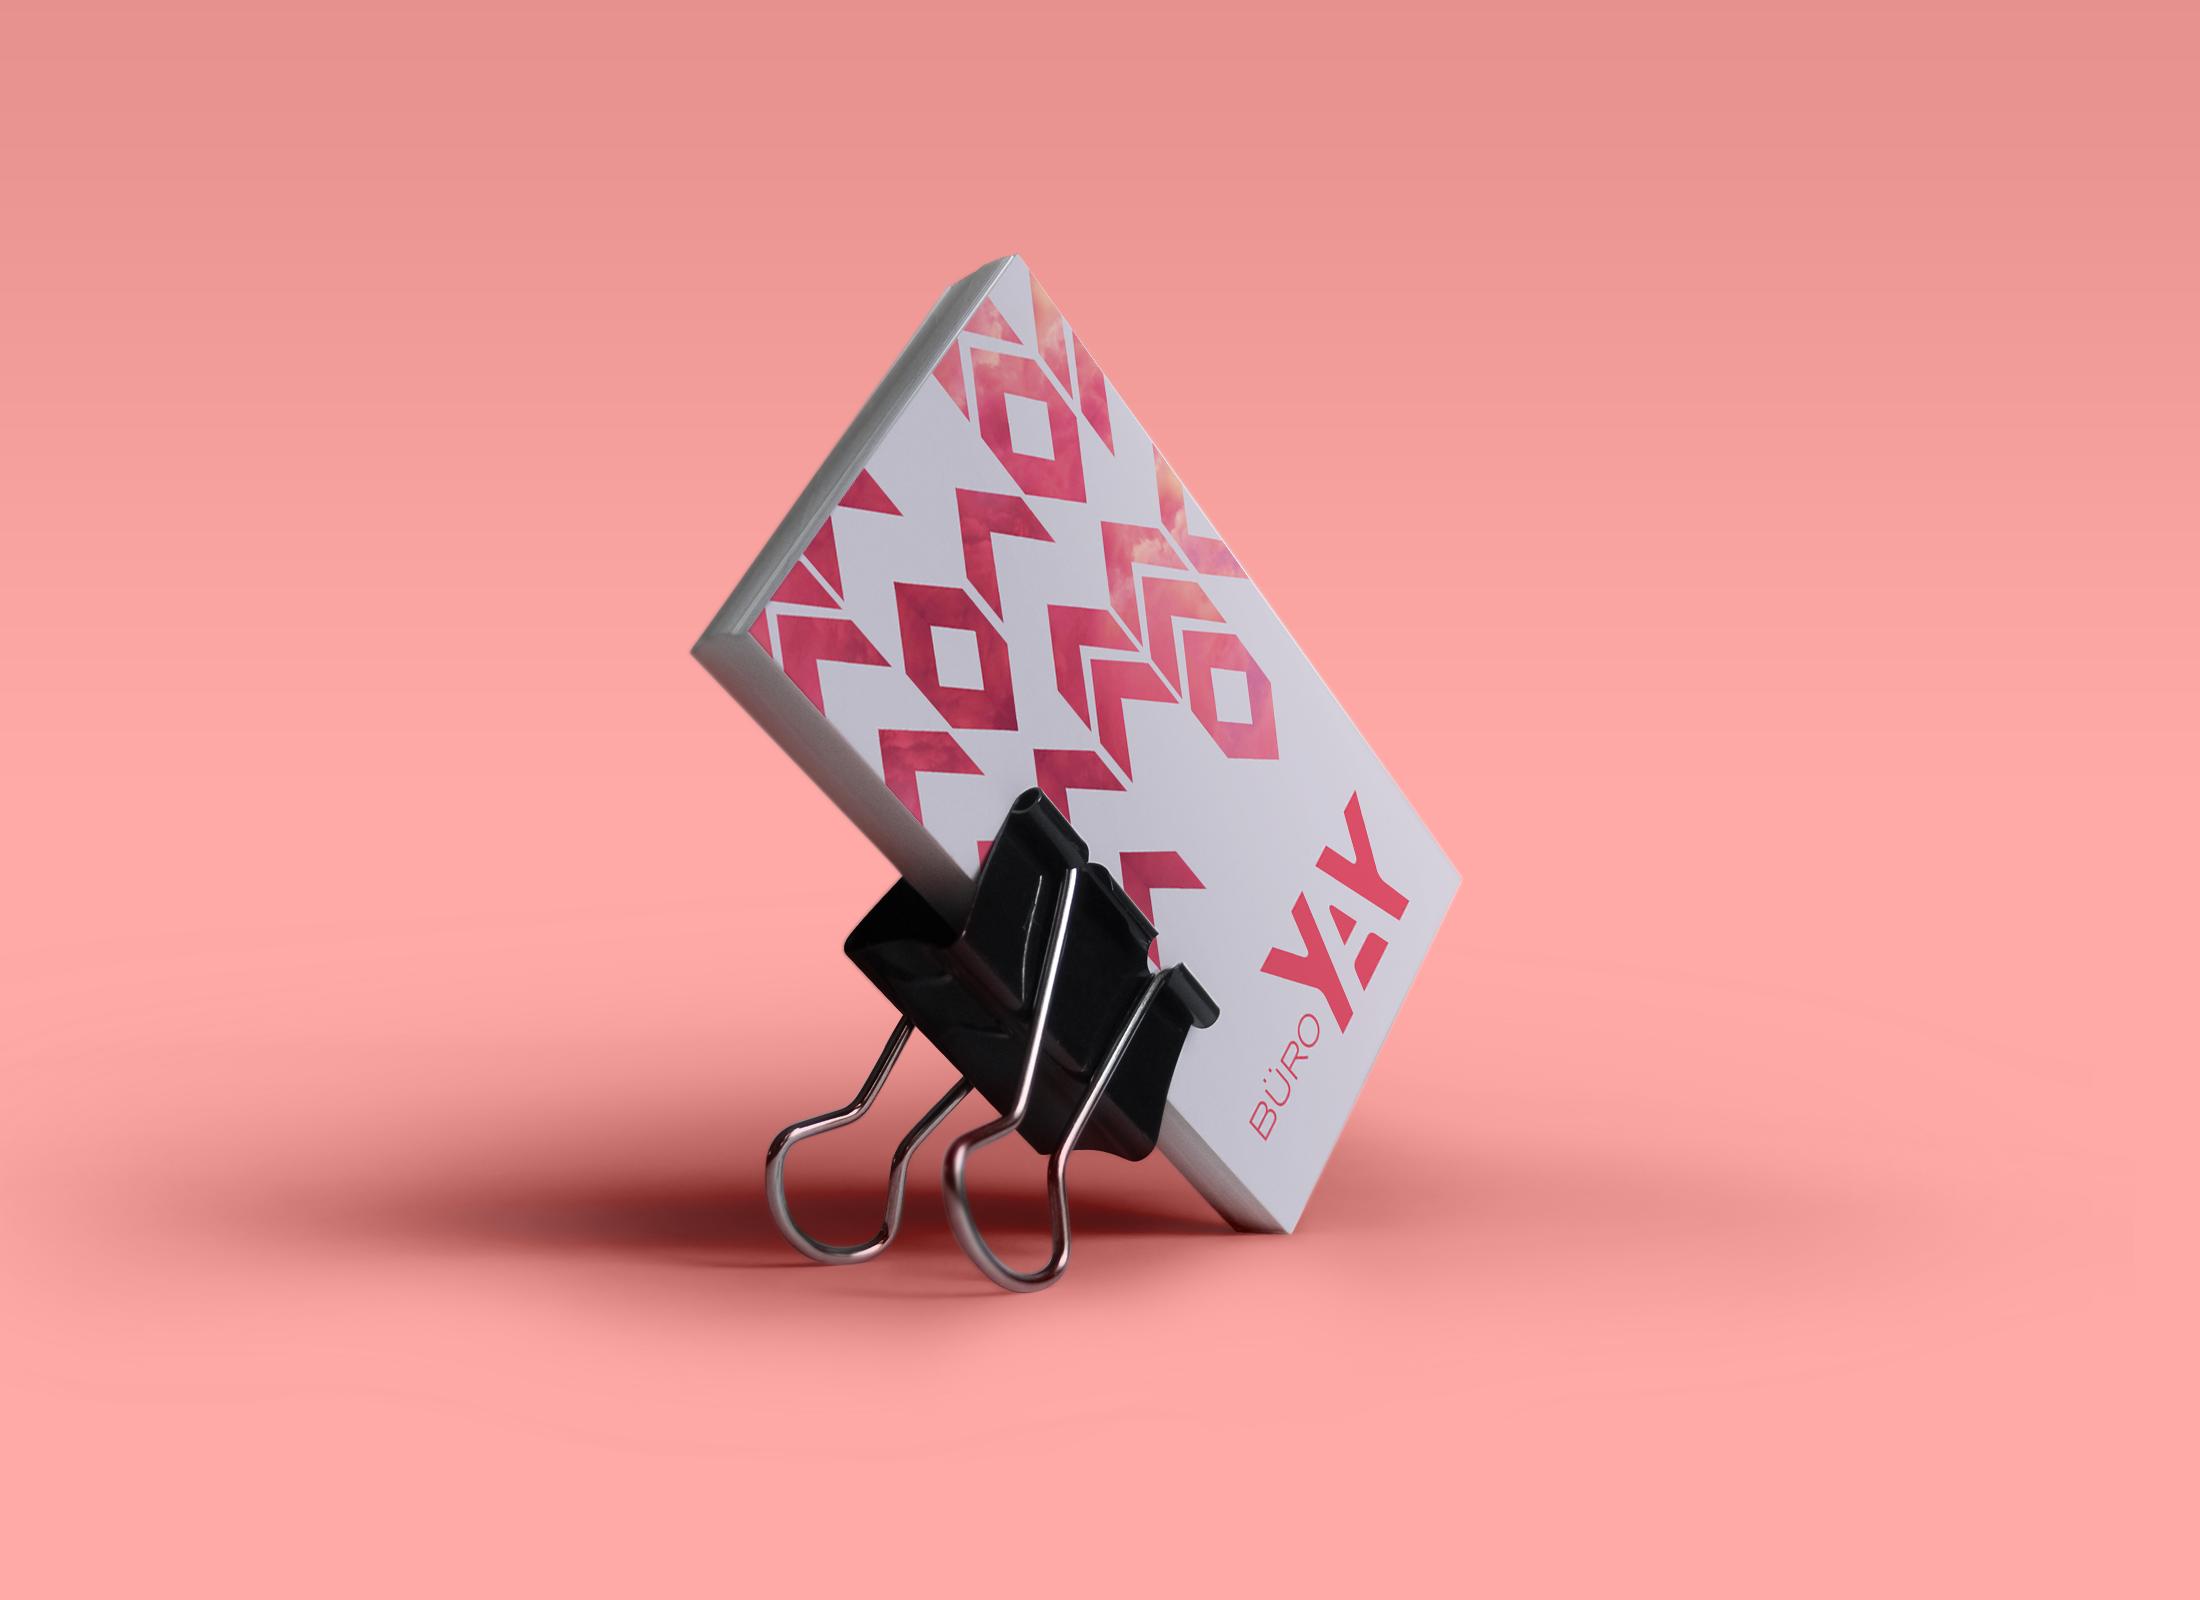 buroyay, visitkort, grafisk design, krims, maria refsgaard, freelance, grafiker, aarhus